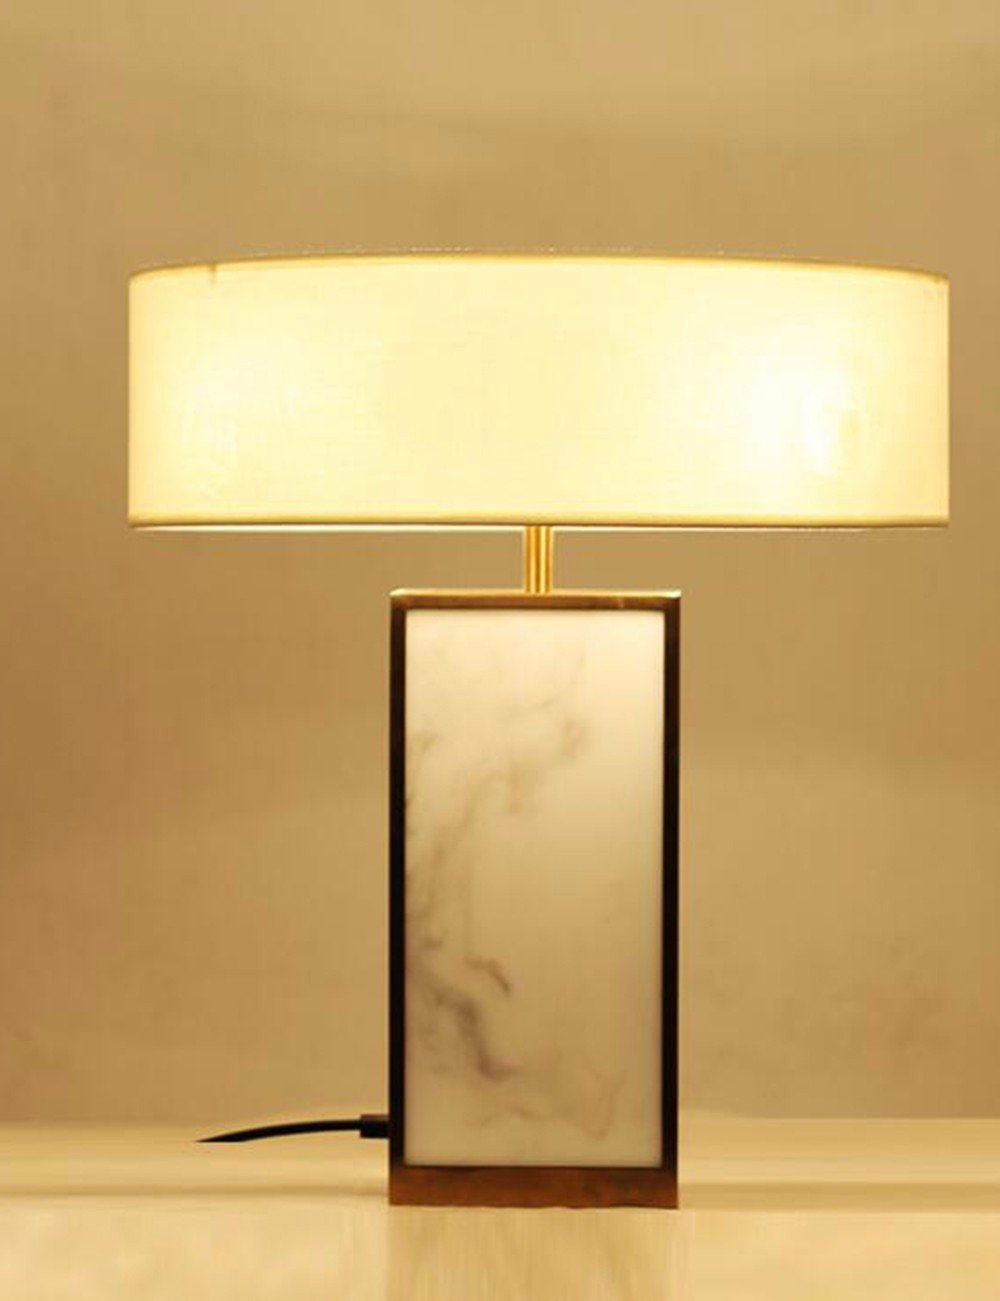 CJSHV-moderni minimalista marmo lampade, camera studio scrivania, hotel decorativi lampada, arte lampada.